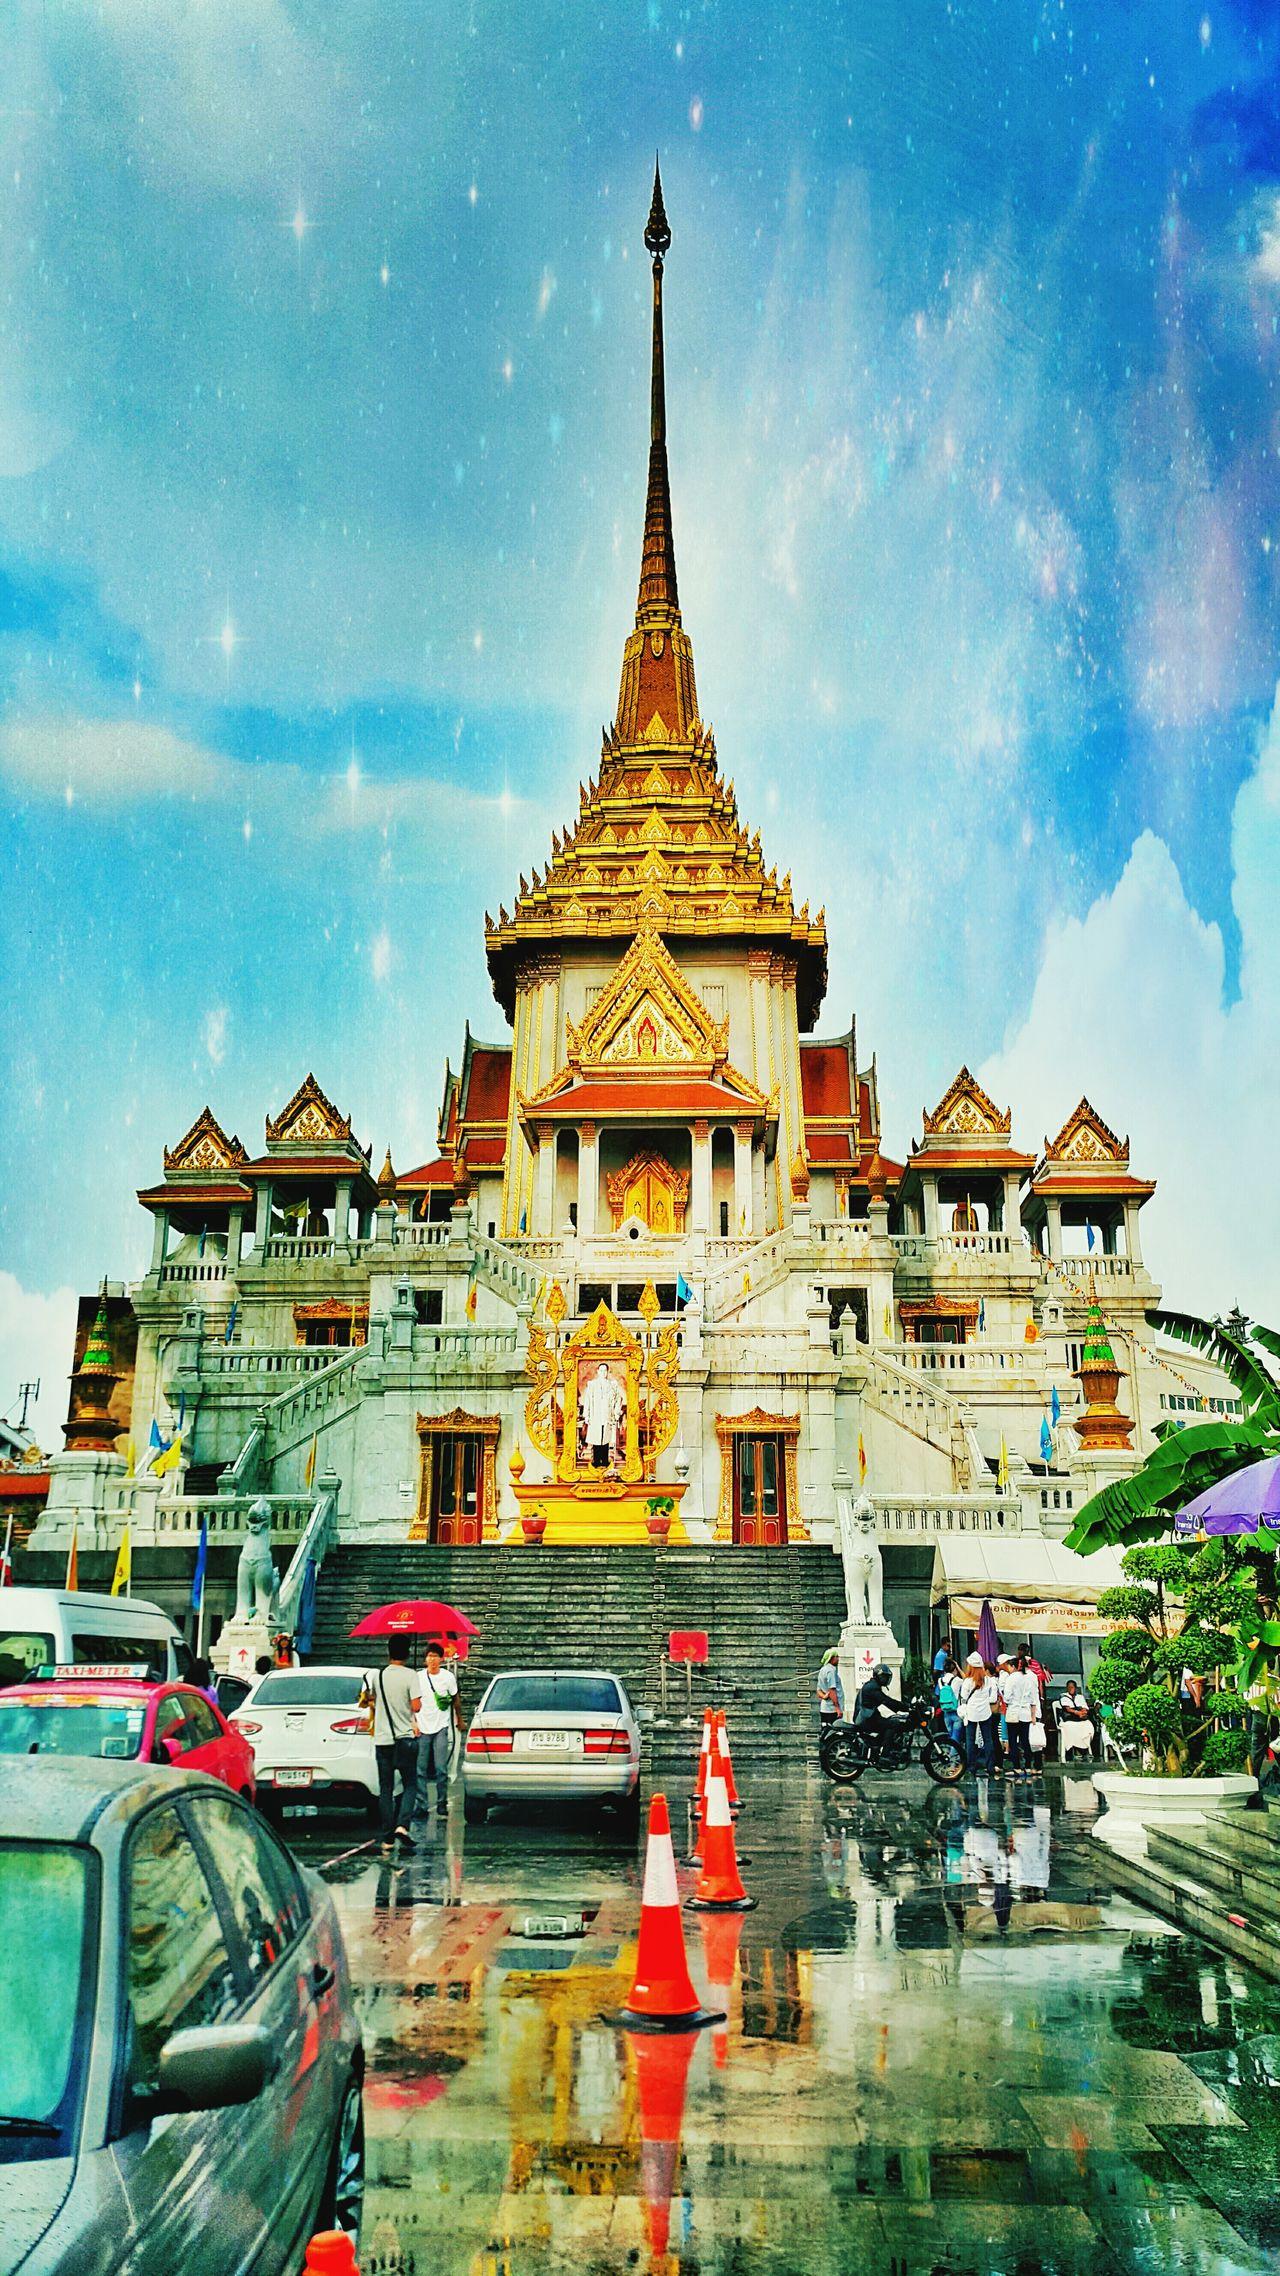 Temple Thailand Bangkok Trimittemple